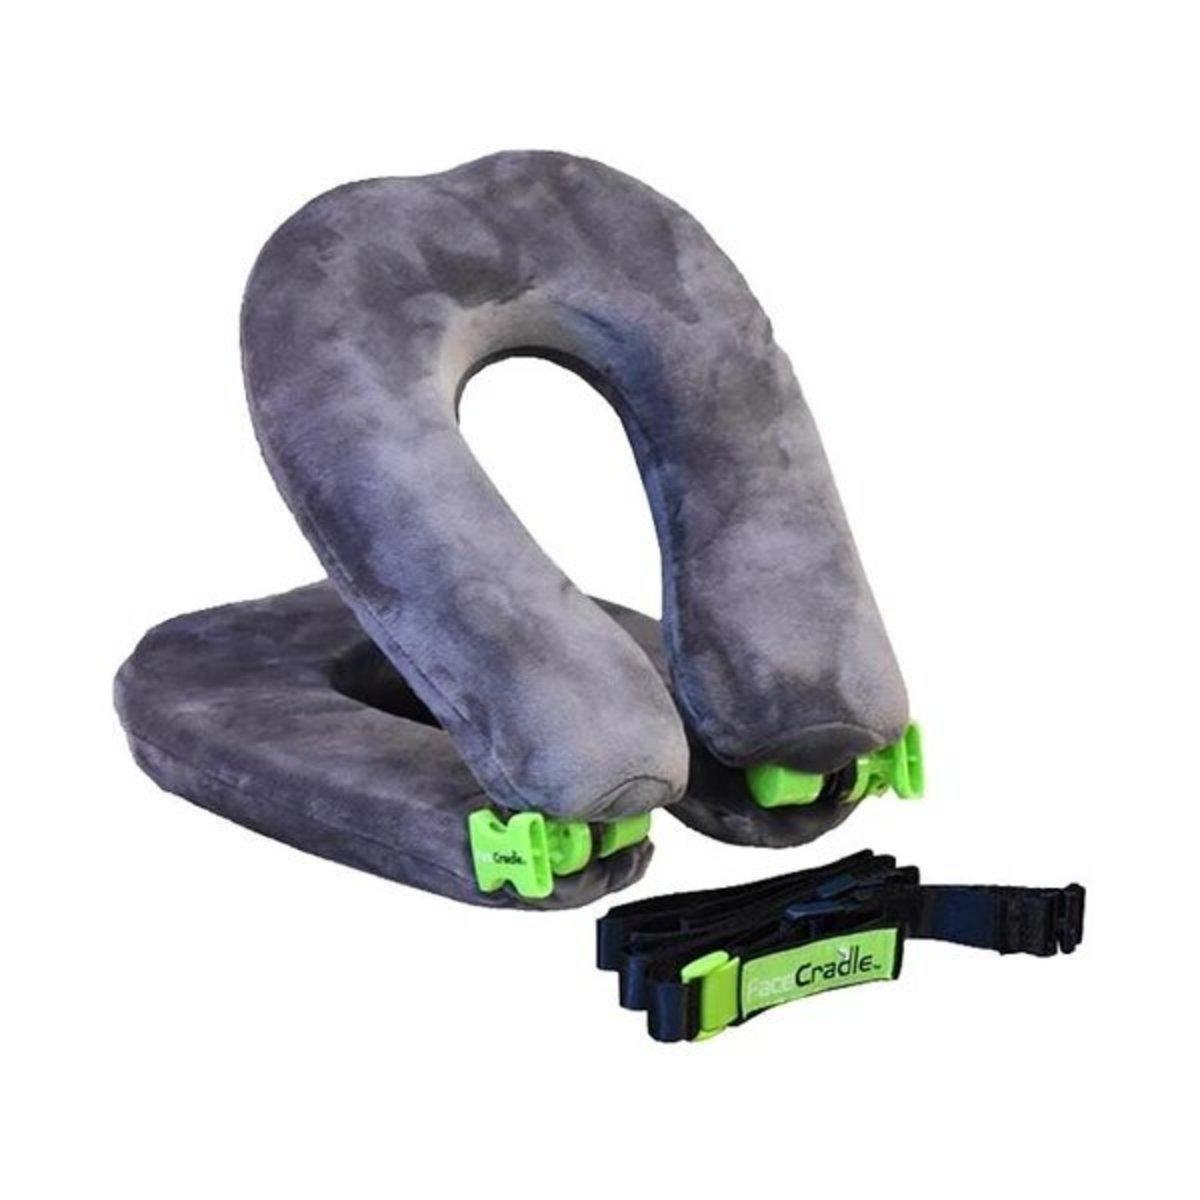 Wanderlust Versatile Travel Neck Pillow - Grey